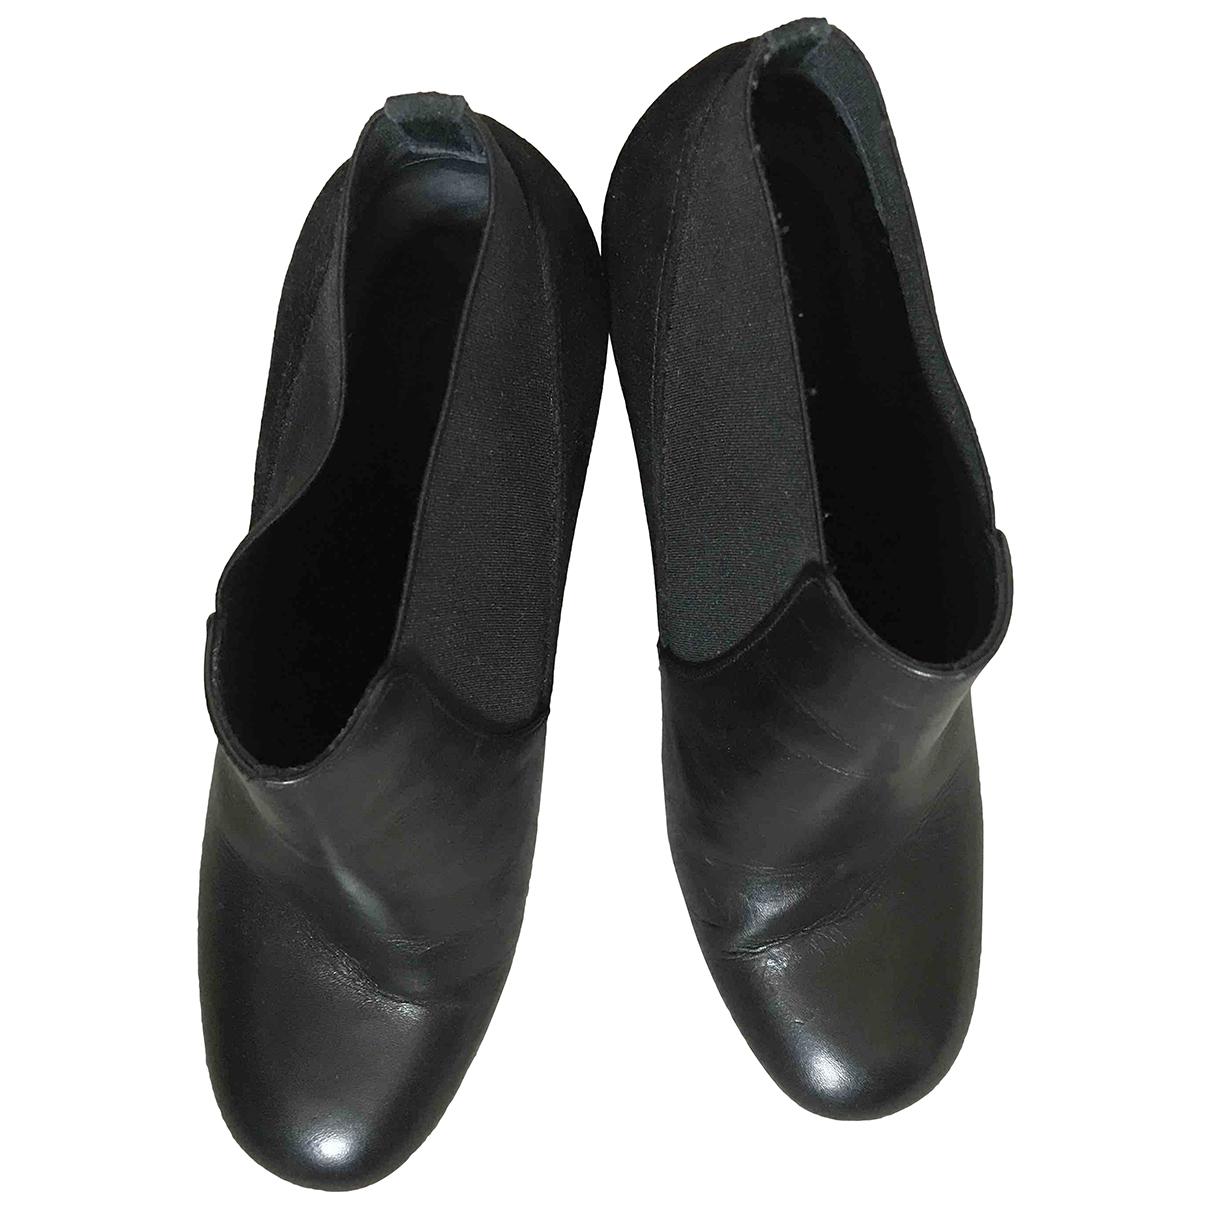 Cos \N Stiefeletten in  Schwarz Leder